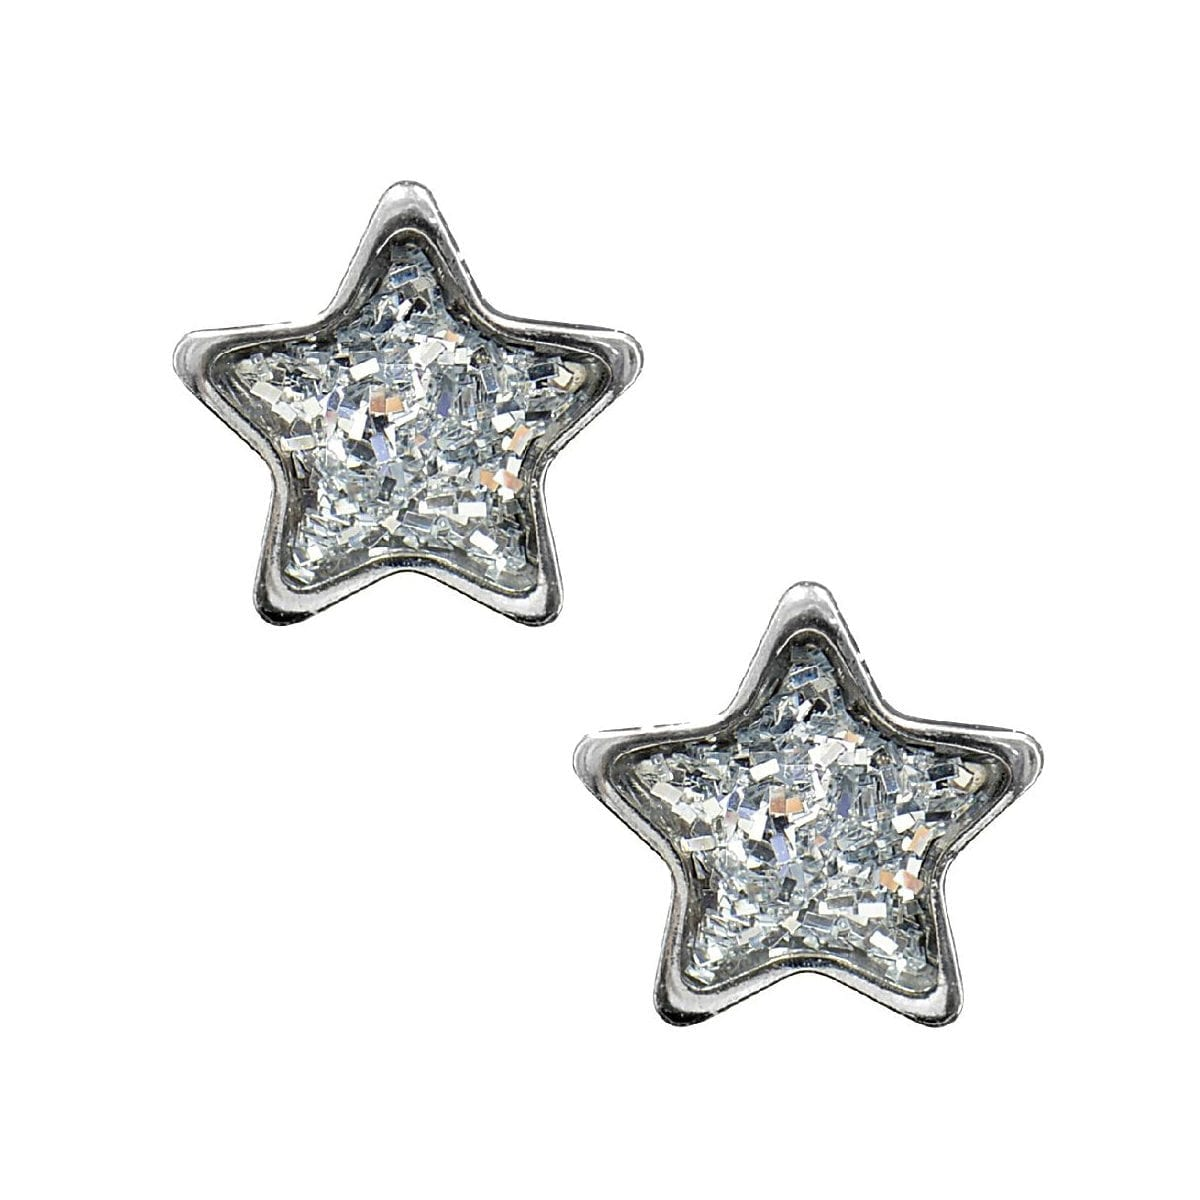 studex-sensitive-clear-glitter-centre-star-stud-earrings-colour-stainless-7811-p